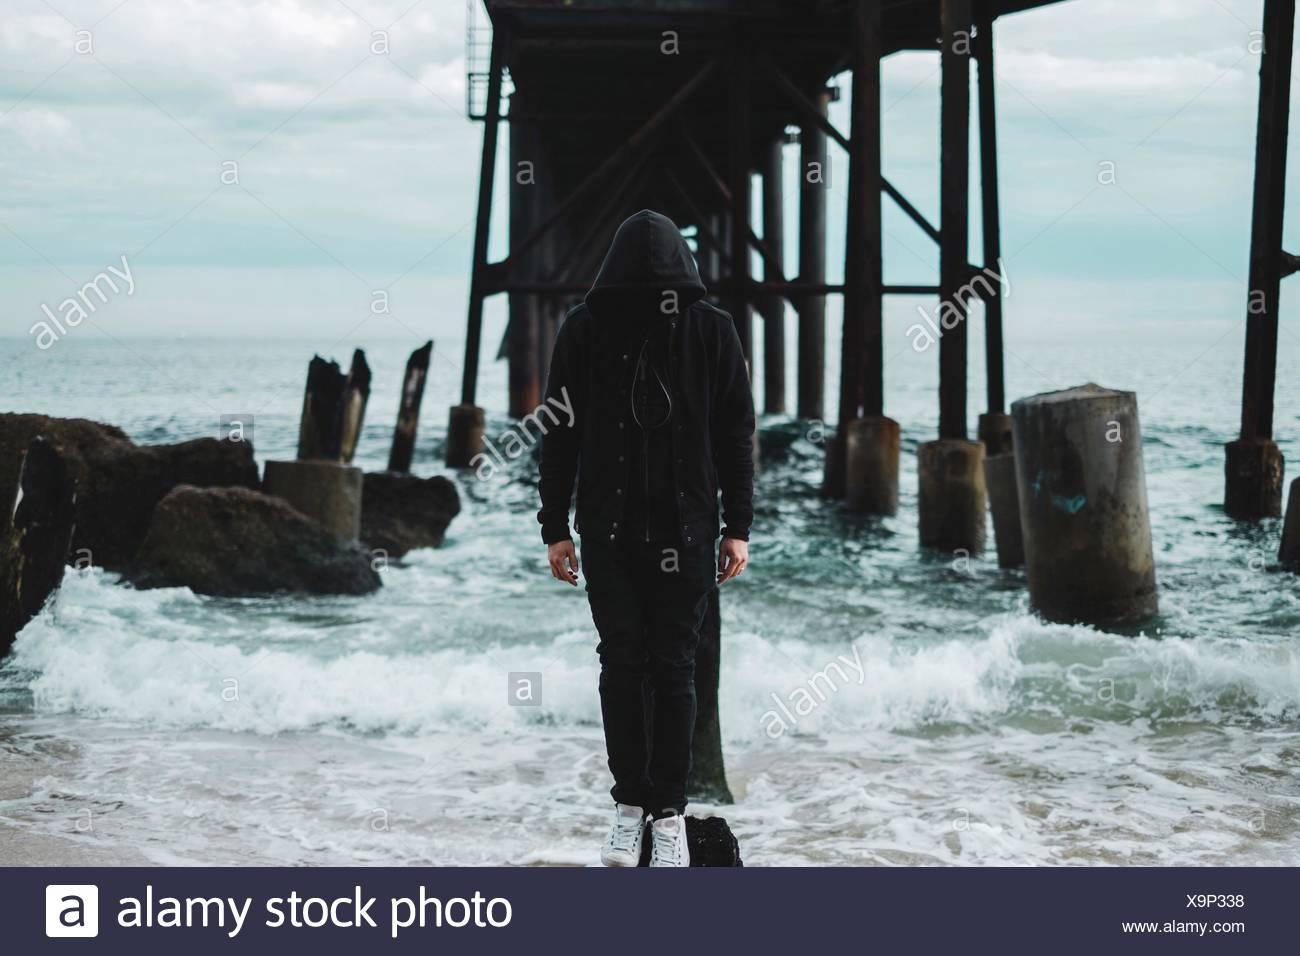 Geheimnisvolle Mann auf Felsen im Meer Stockbild